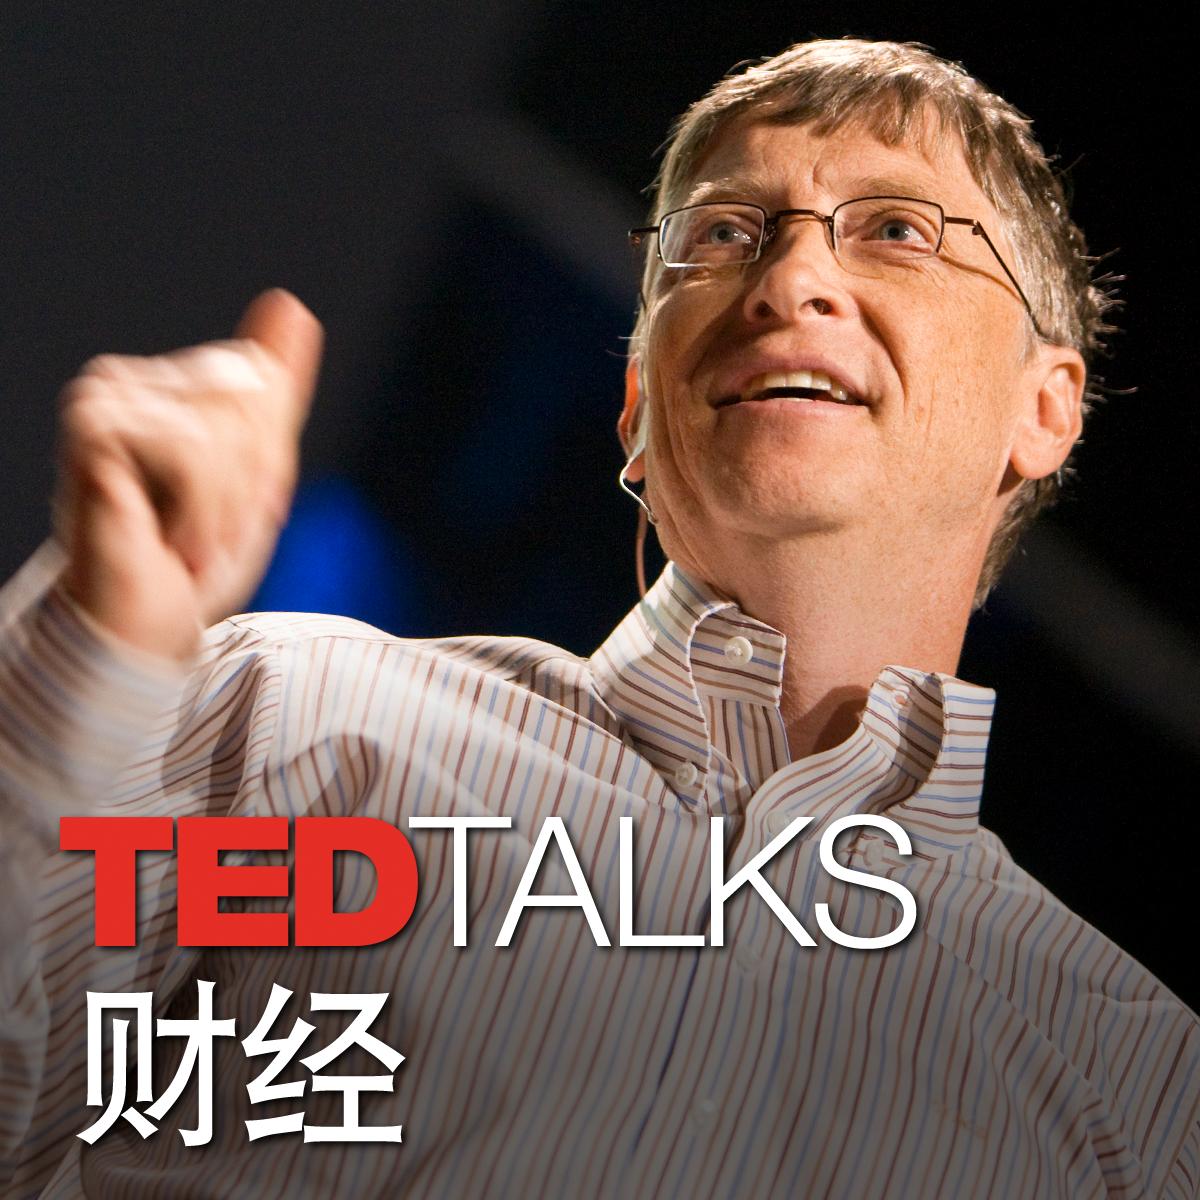 TEDTalks 财经